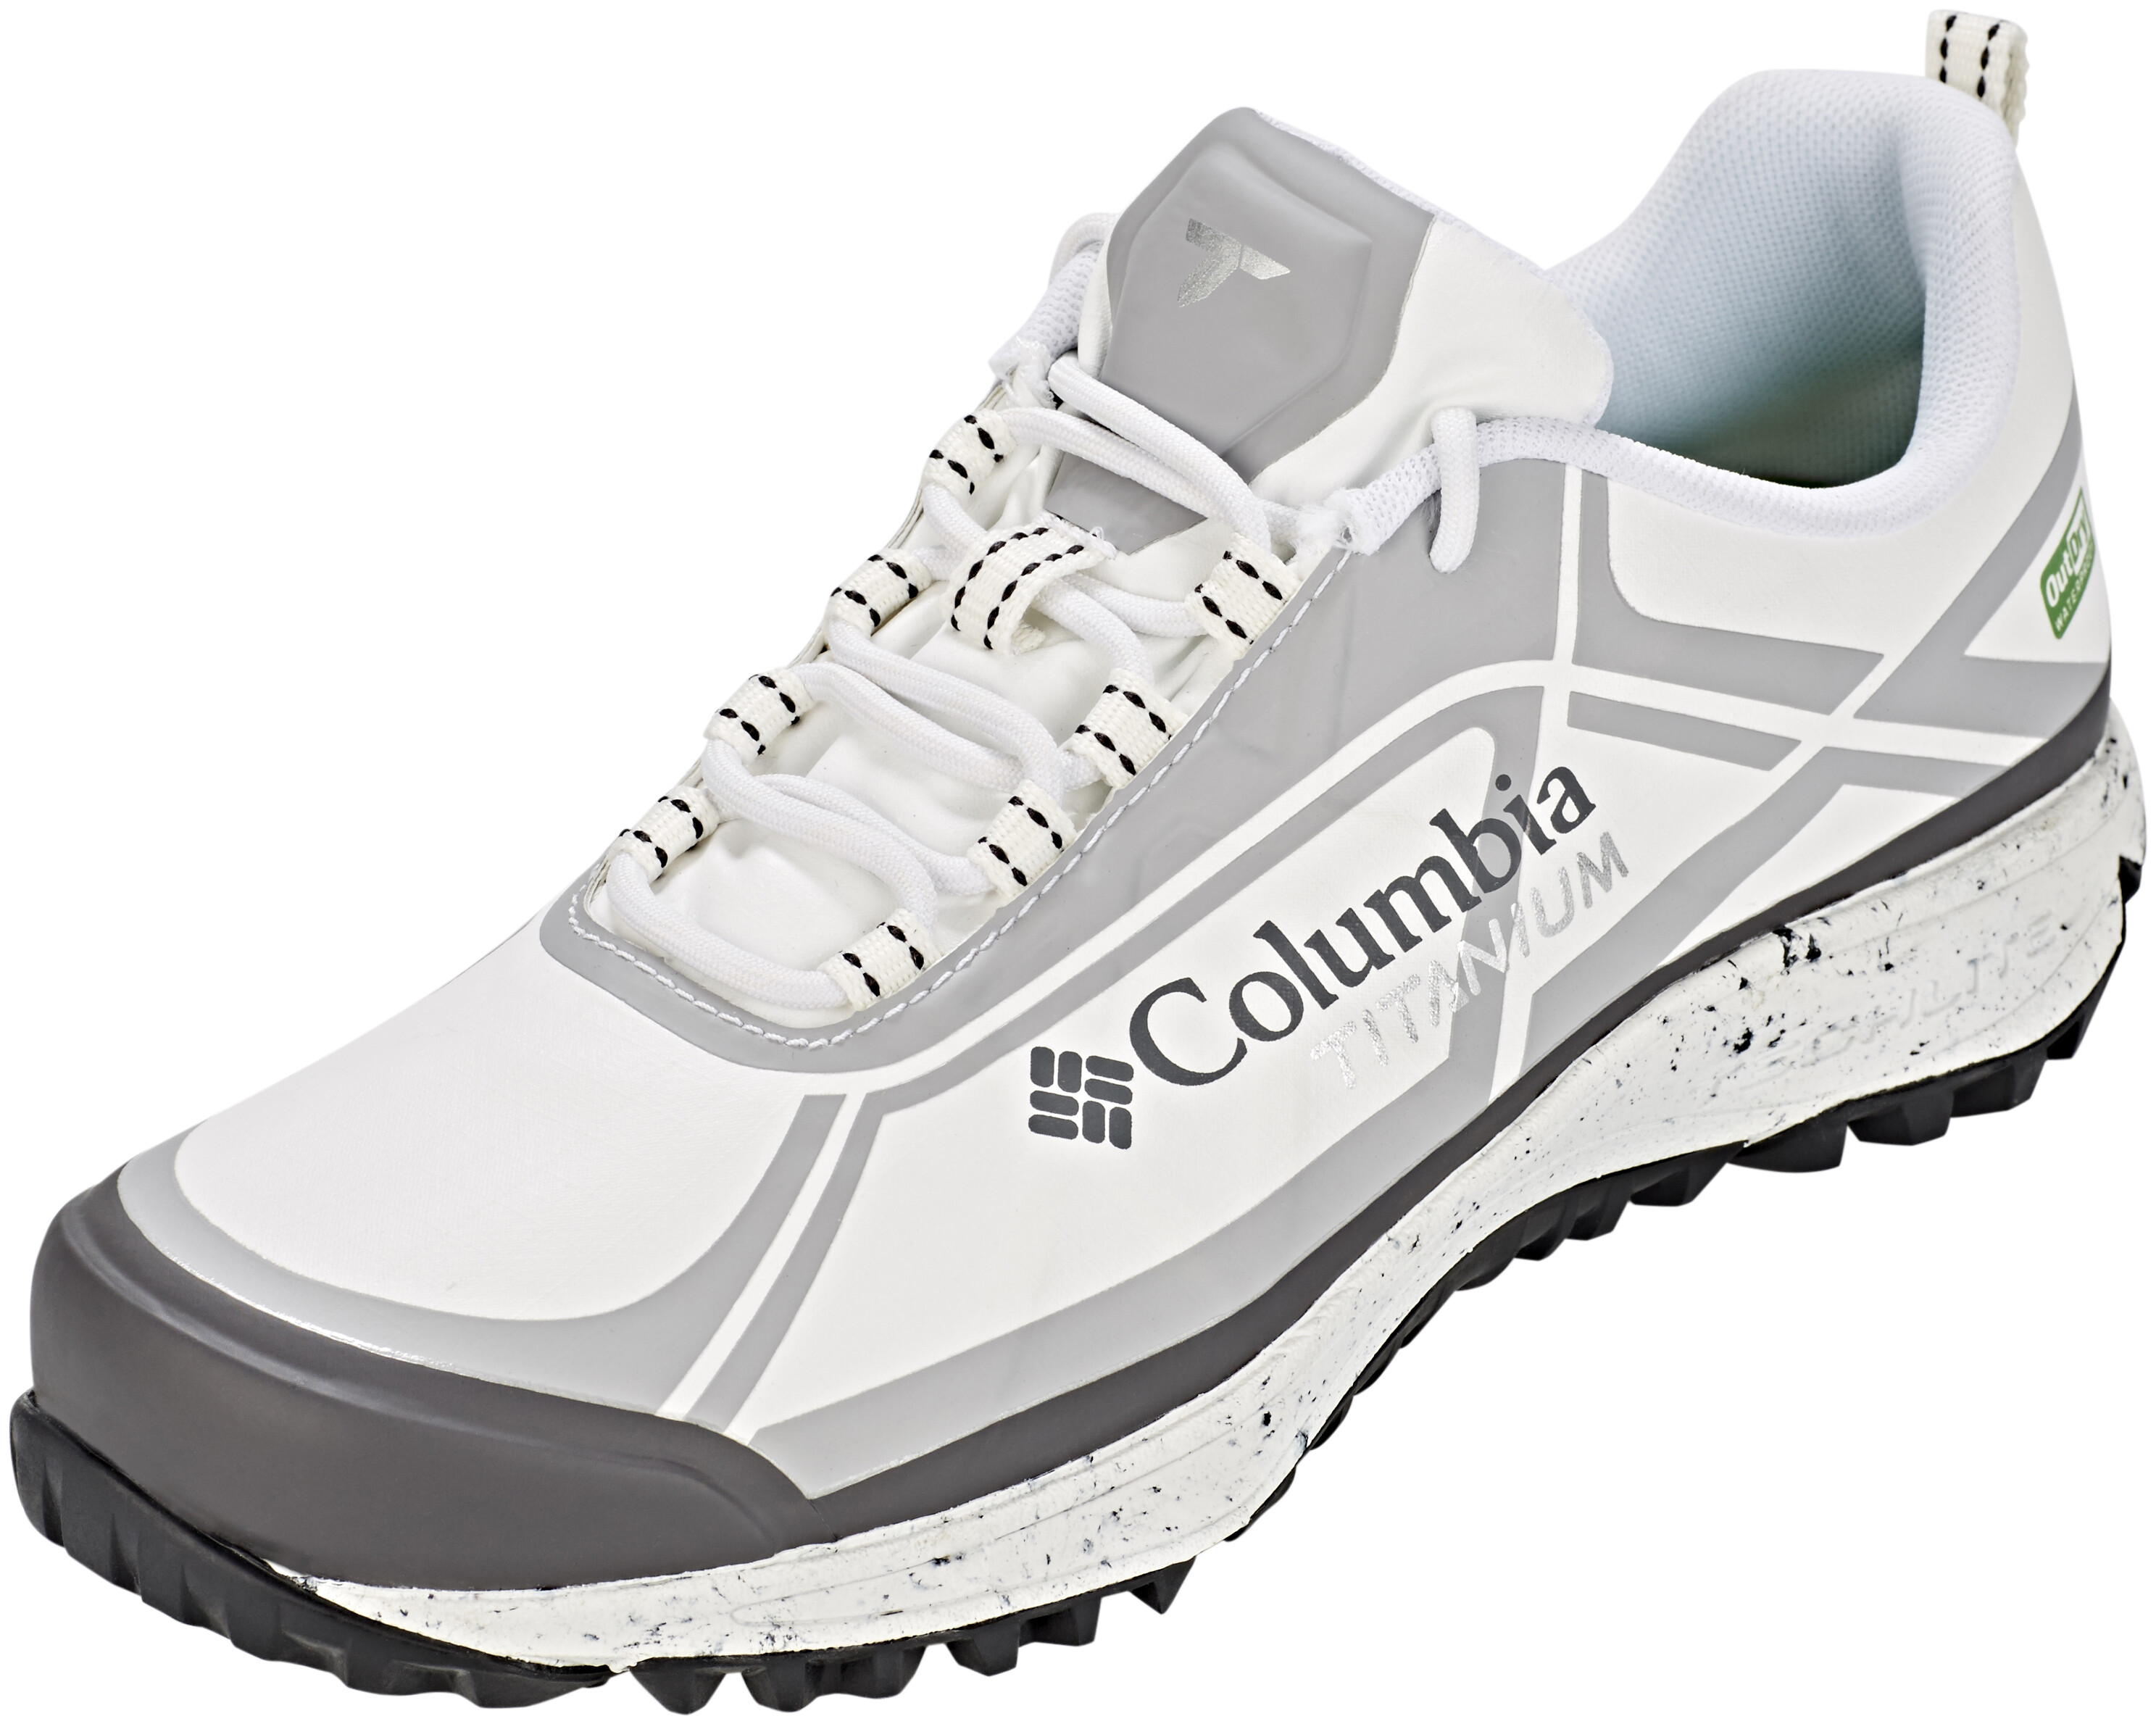 Conspiracy III Mid Outdry Scarpe da Trekking Donna Columbia